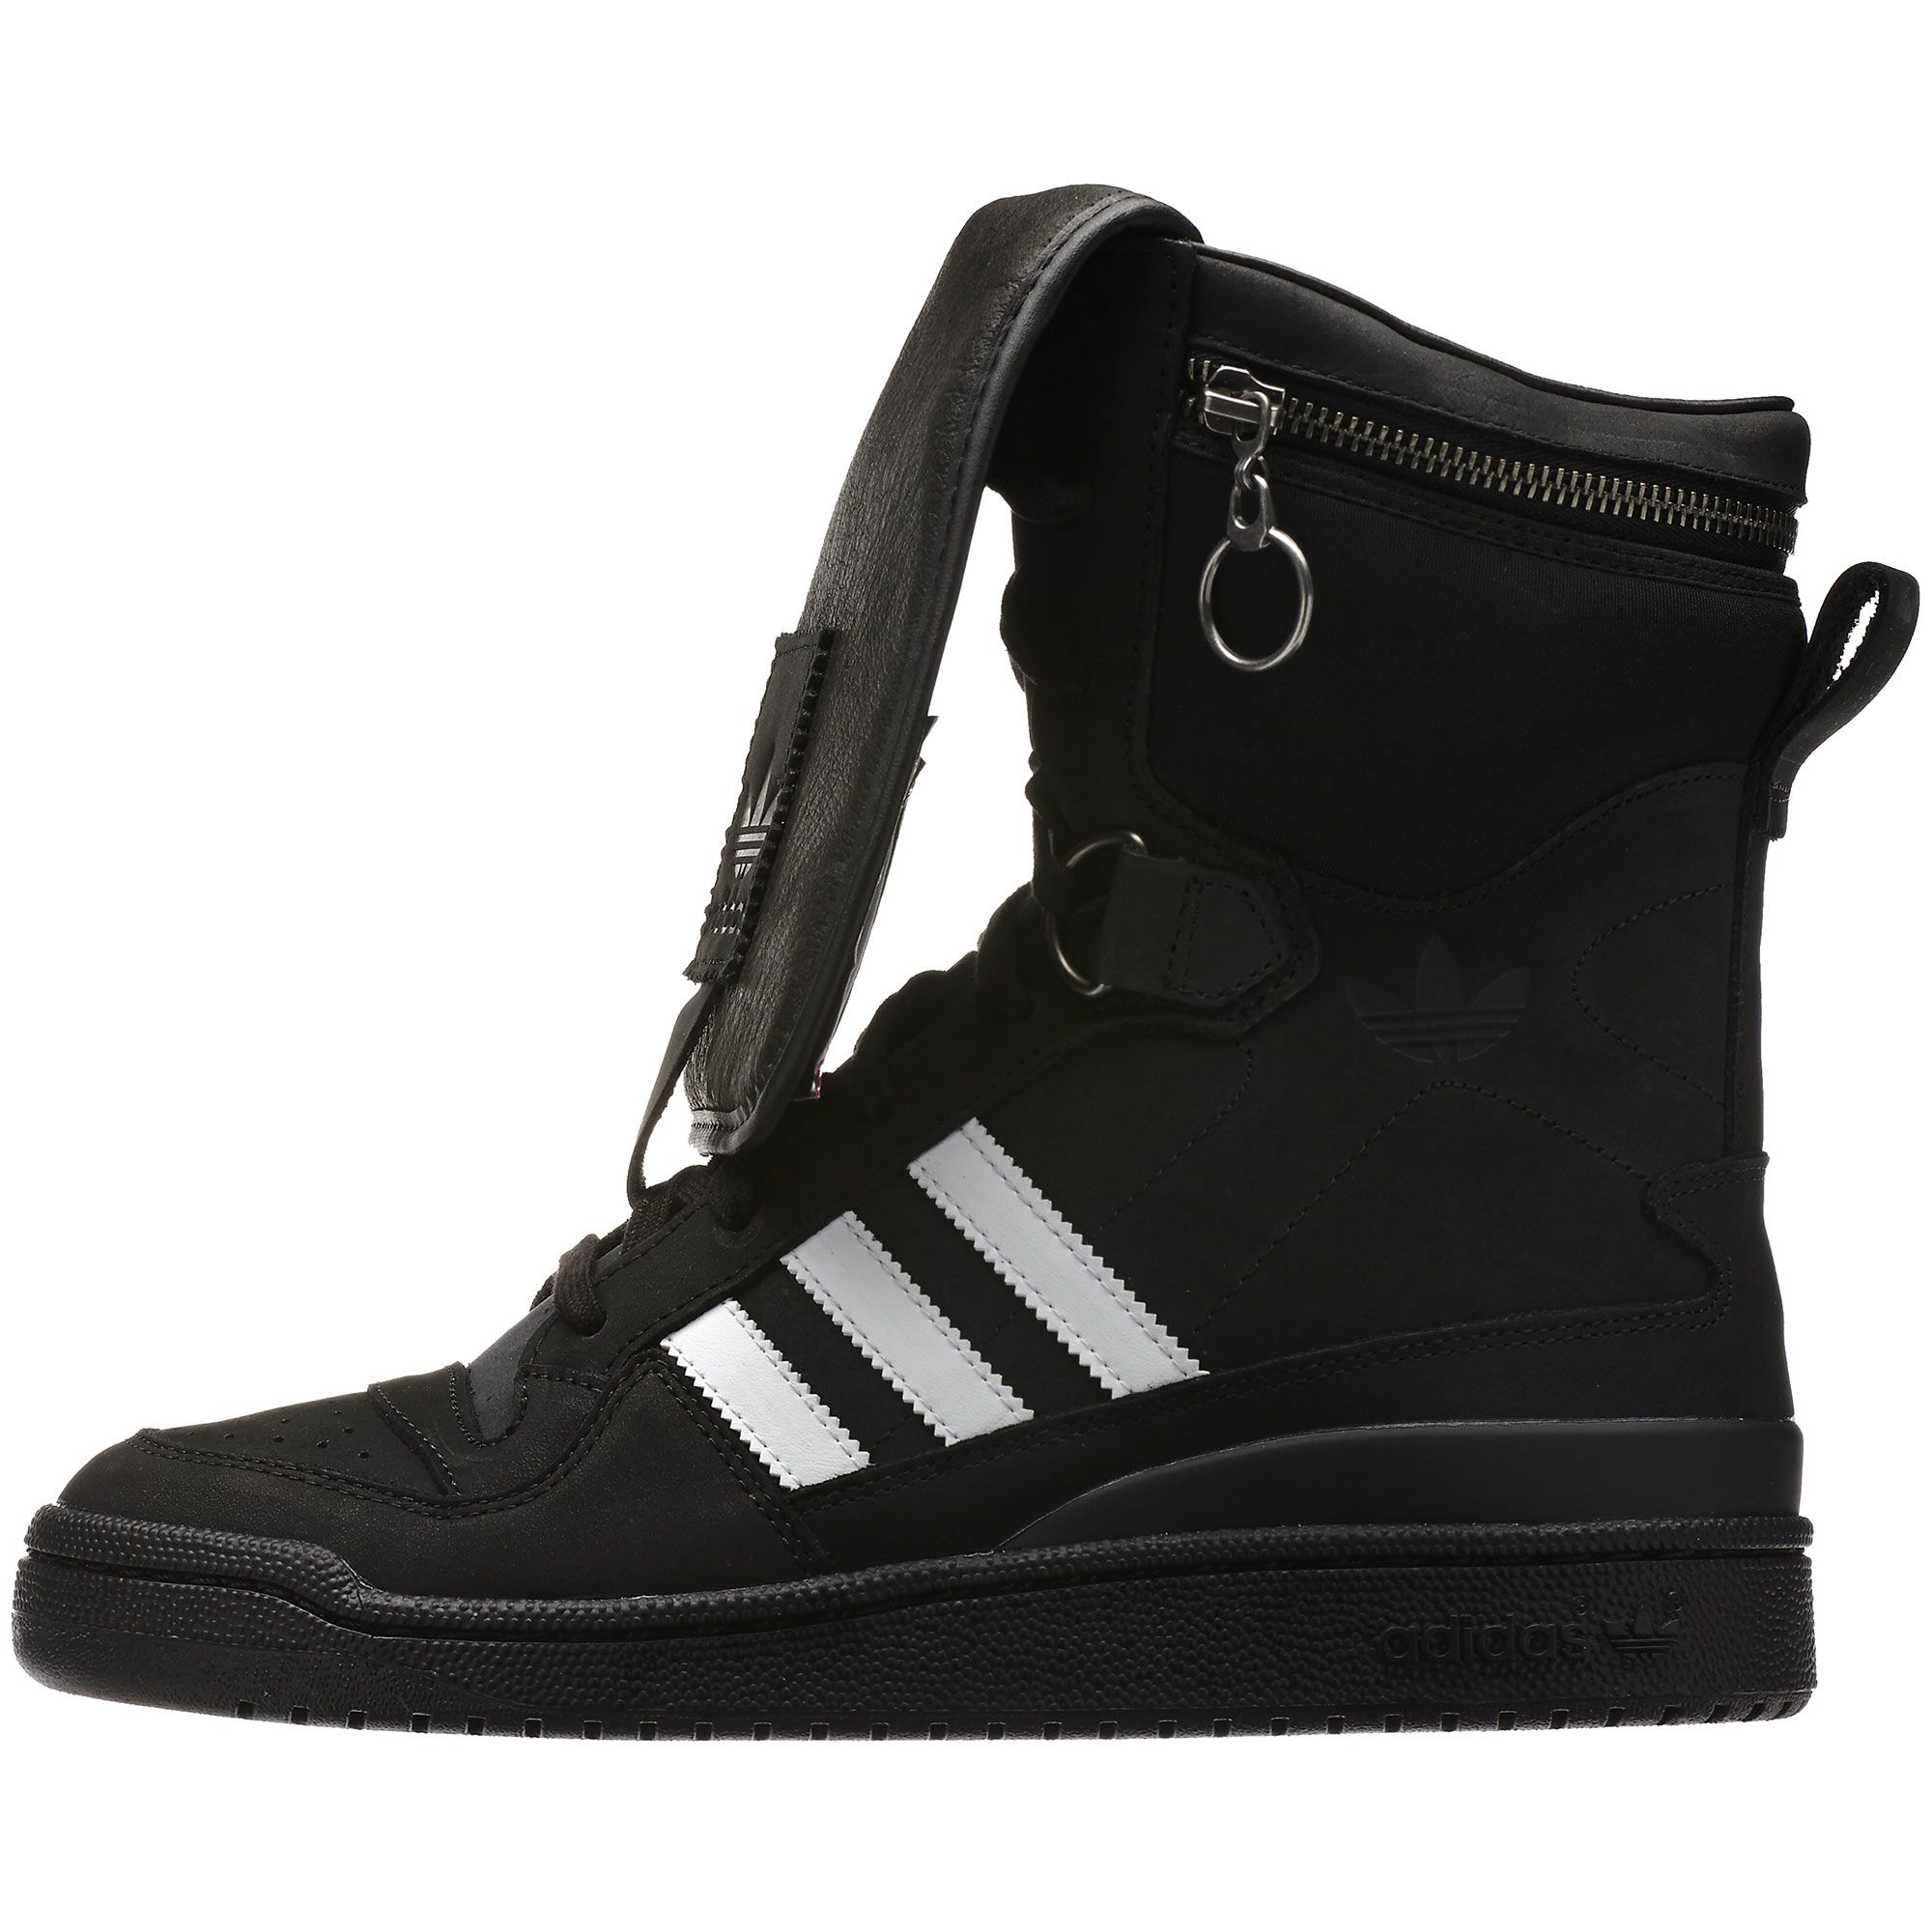 Adidas Italia | Adidas Jeremy Scott Tall Boy Black Black